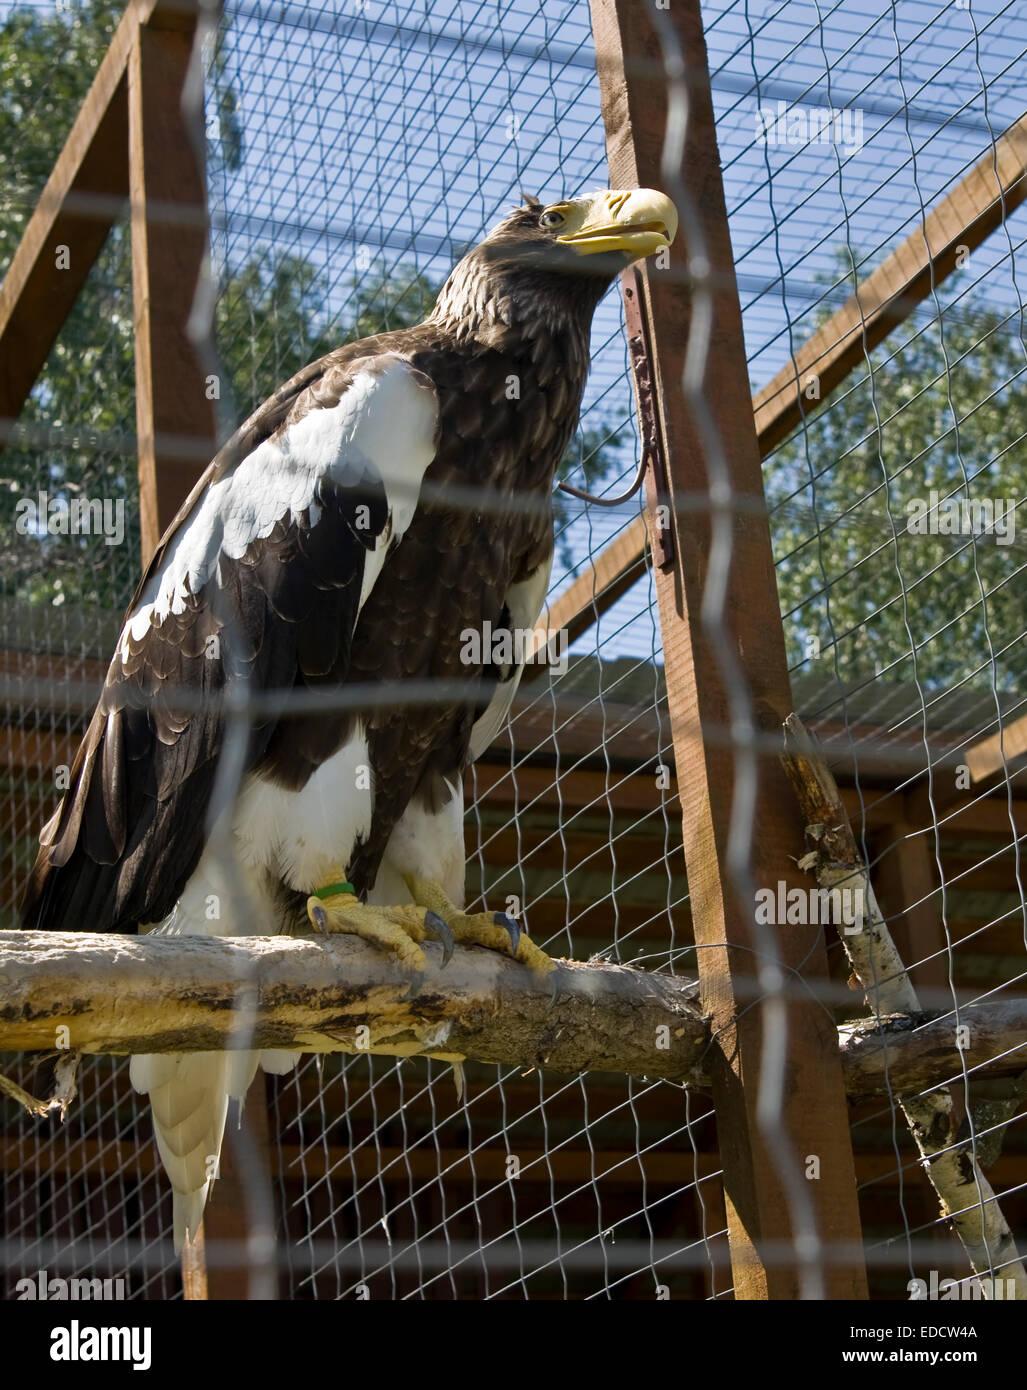 Águila de Mar de Steller (Haliaeetus pelagicus), vive en el Lejano Oriente. Imagen De Stock